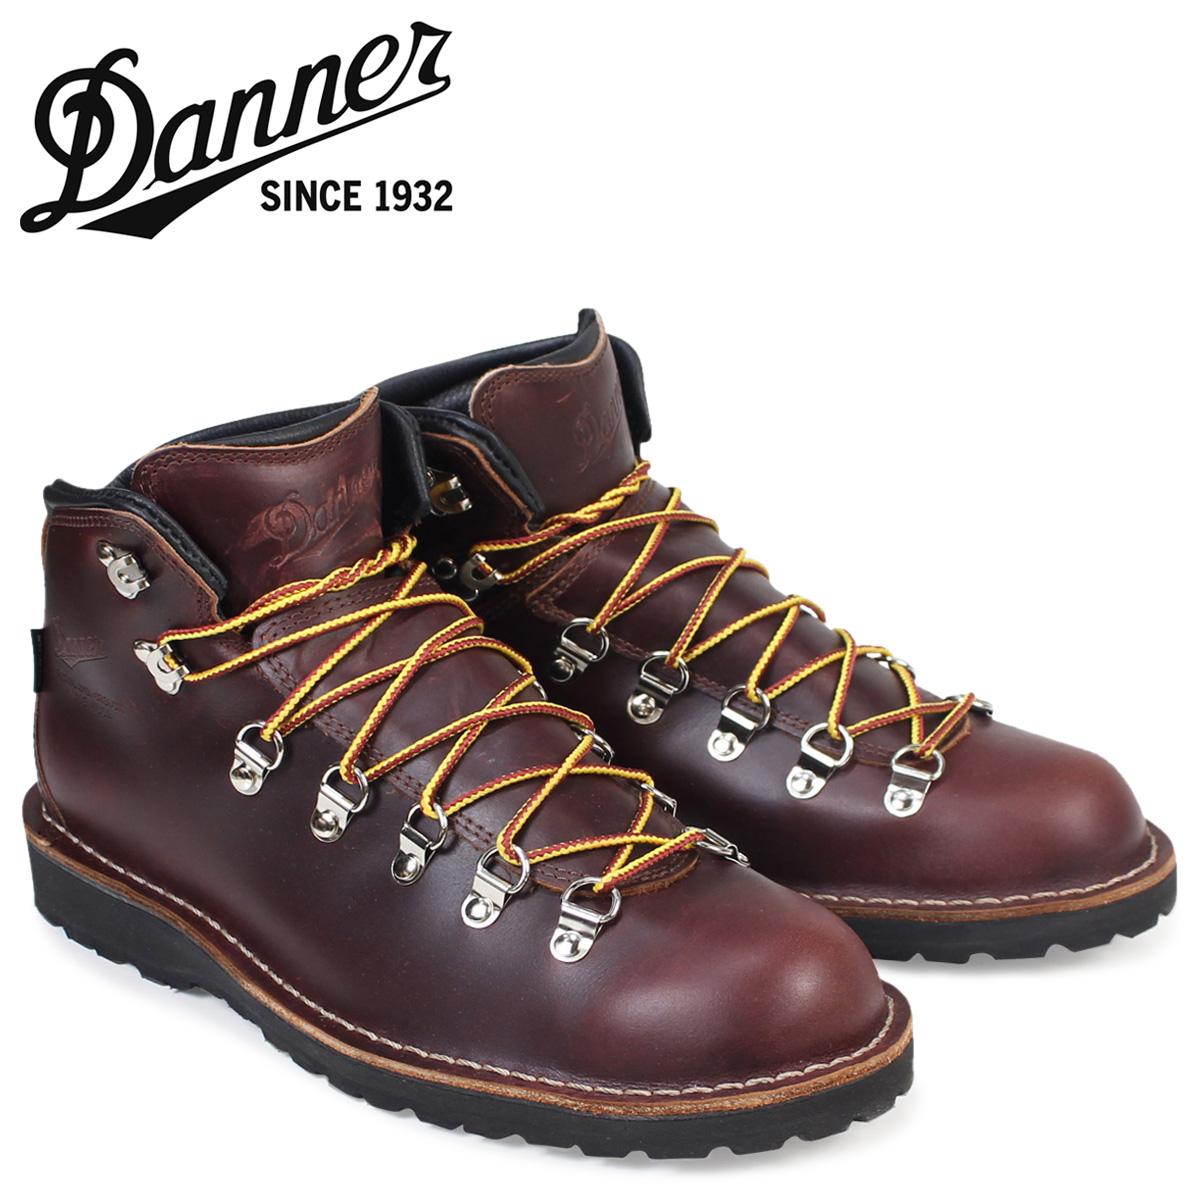 Danner ブーツ ダナー MOUNTAIN PASS 33280 MADE IN USA メンズ ブラウン